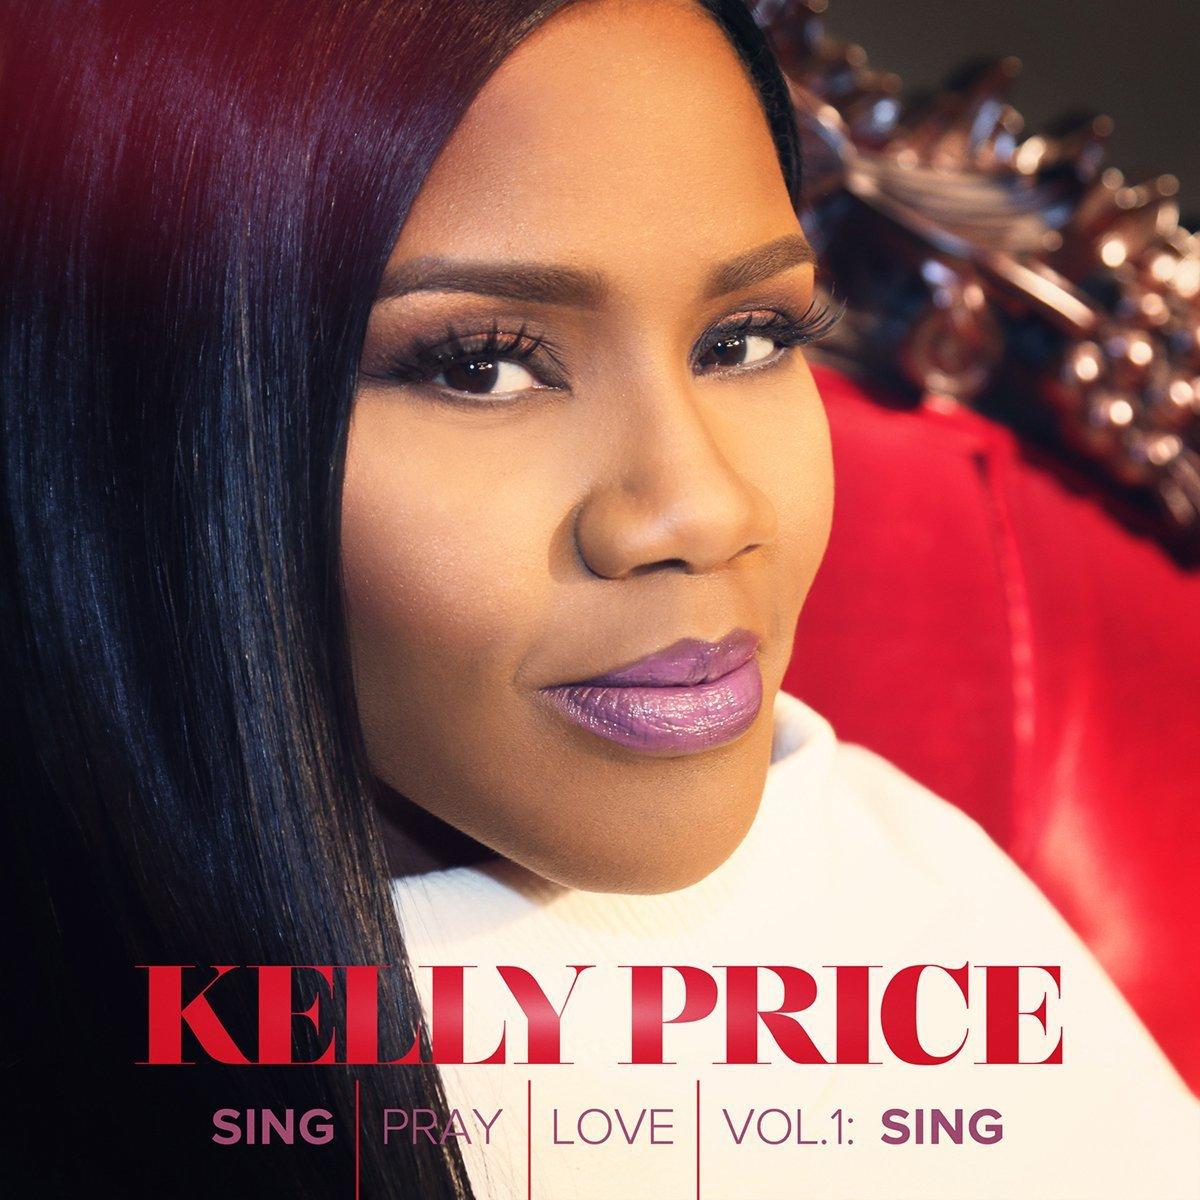 CD : Kelly Price - Sing Pray Love 1 (CD)